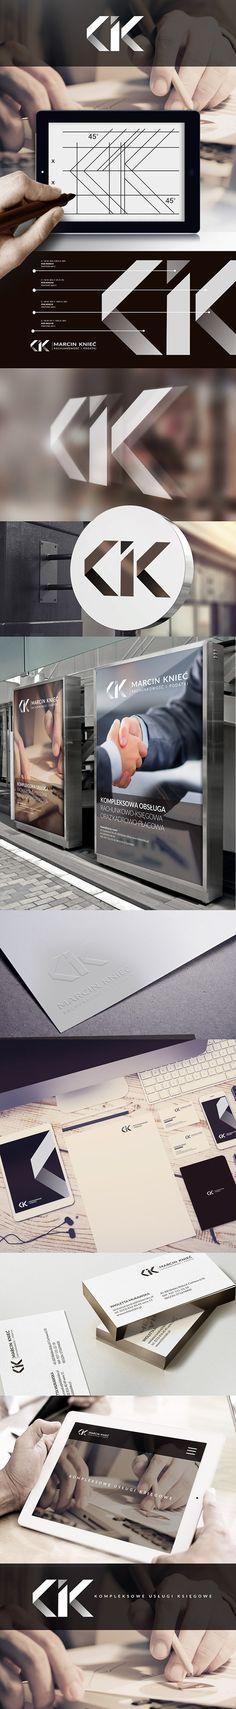 KiK - biuro księgowe on Branding Served